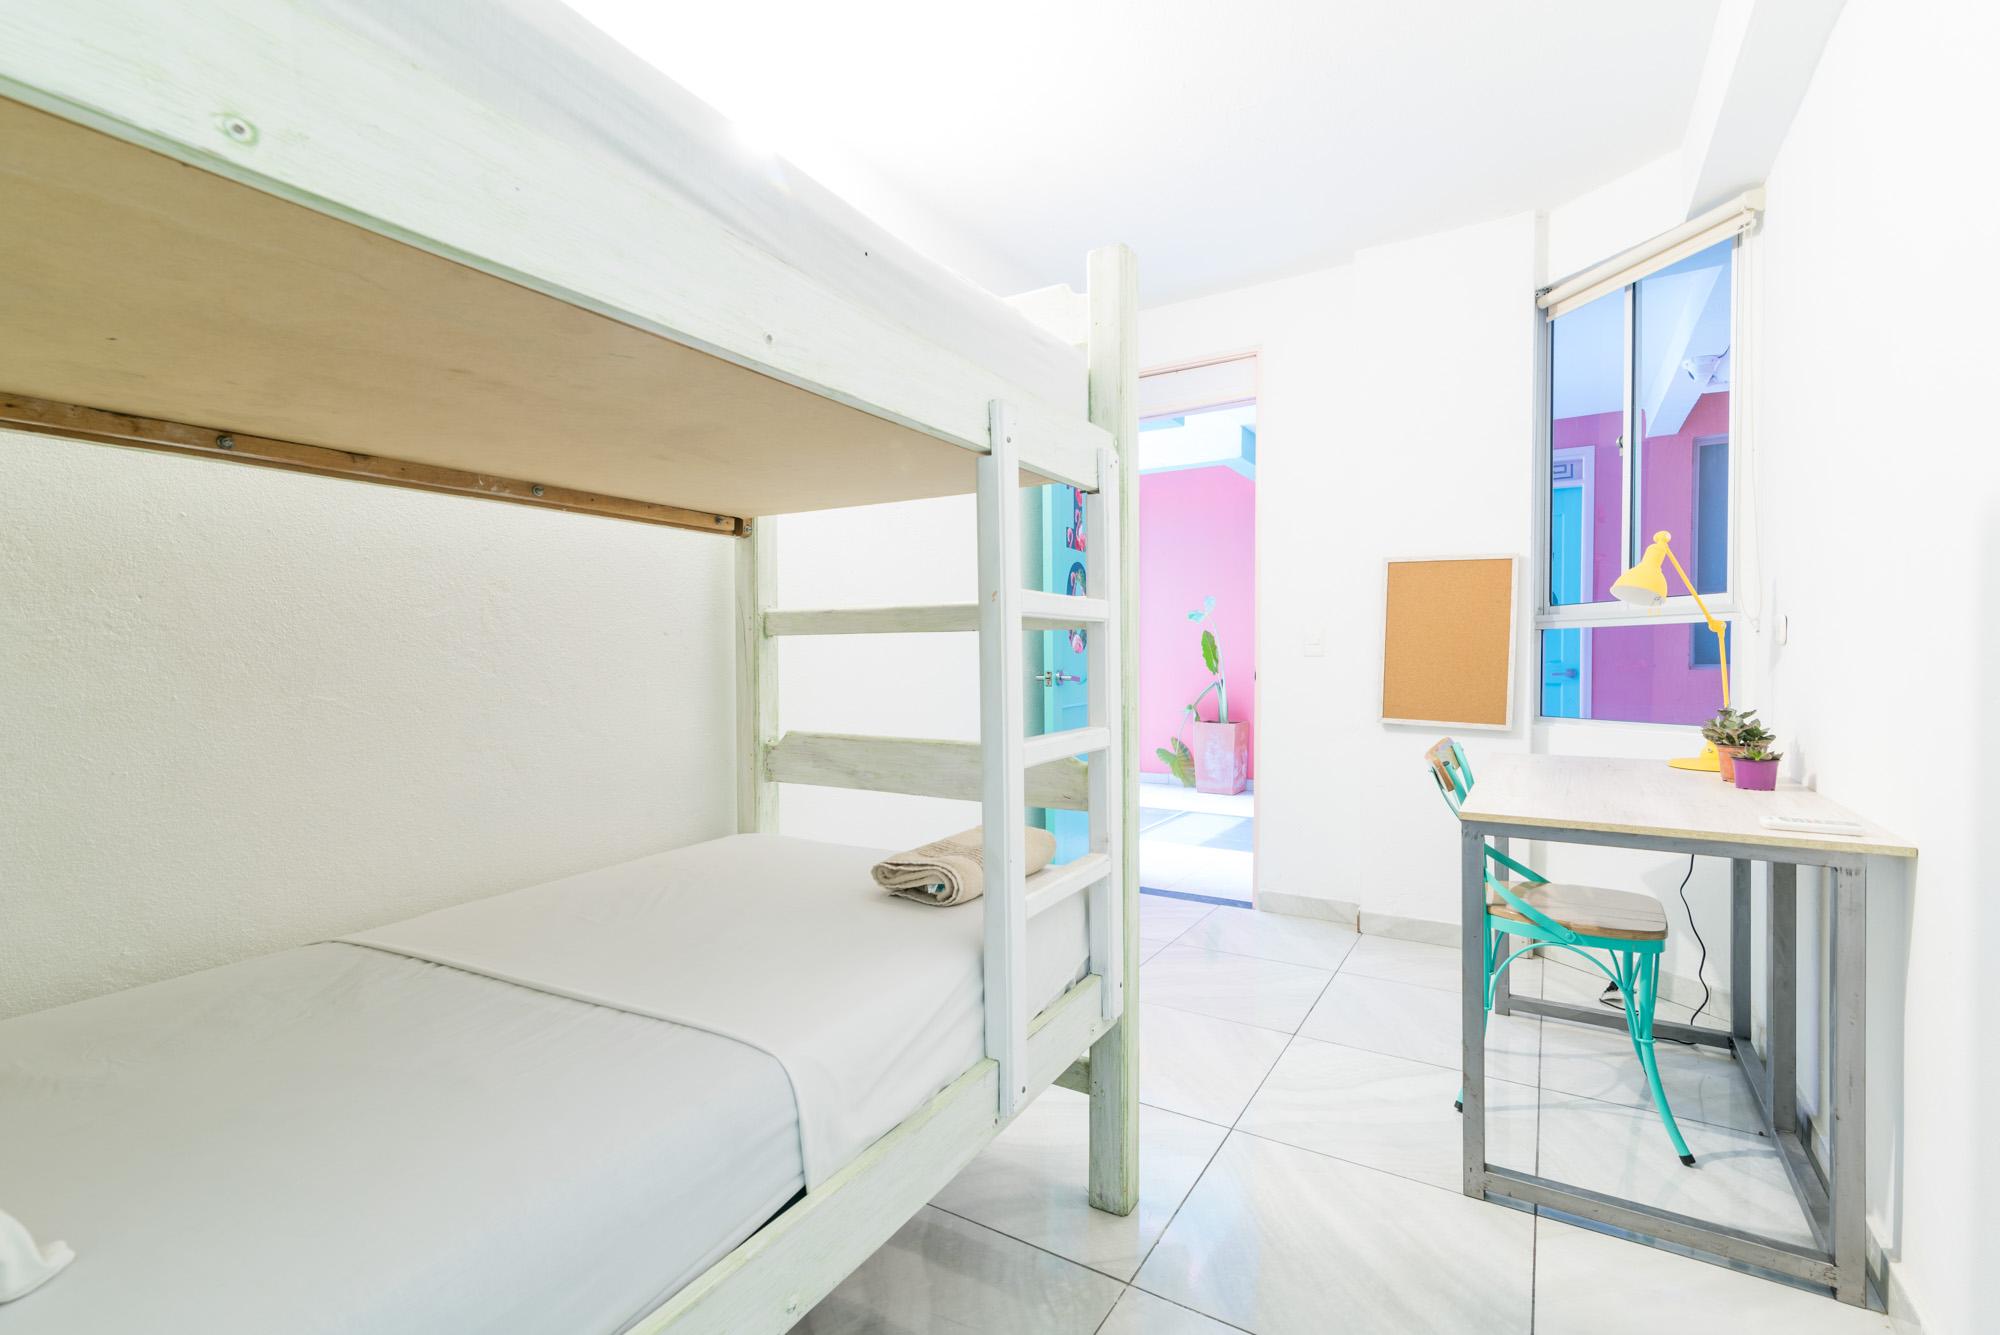 2-Bed Dorm